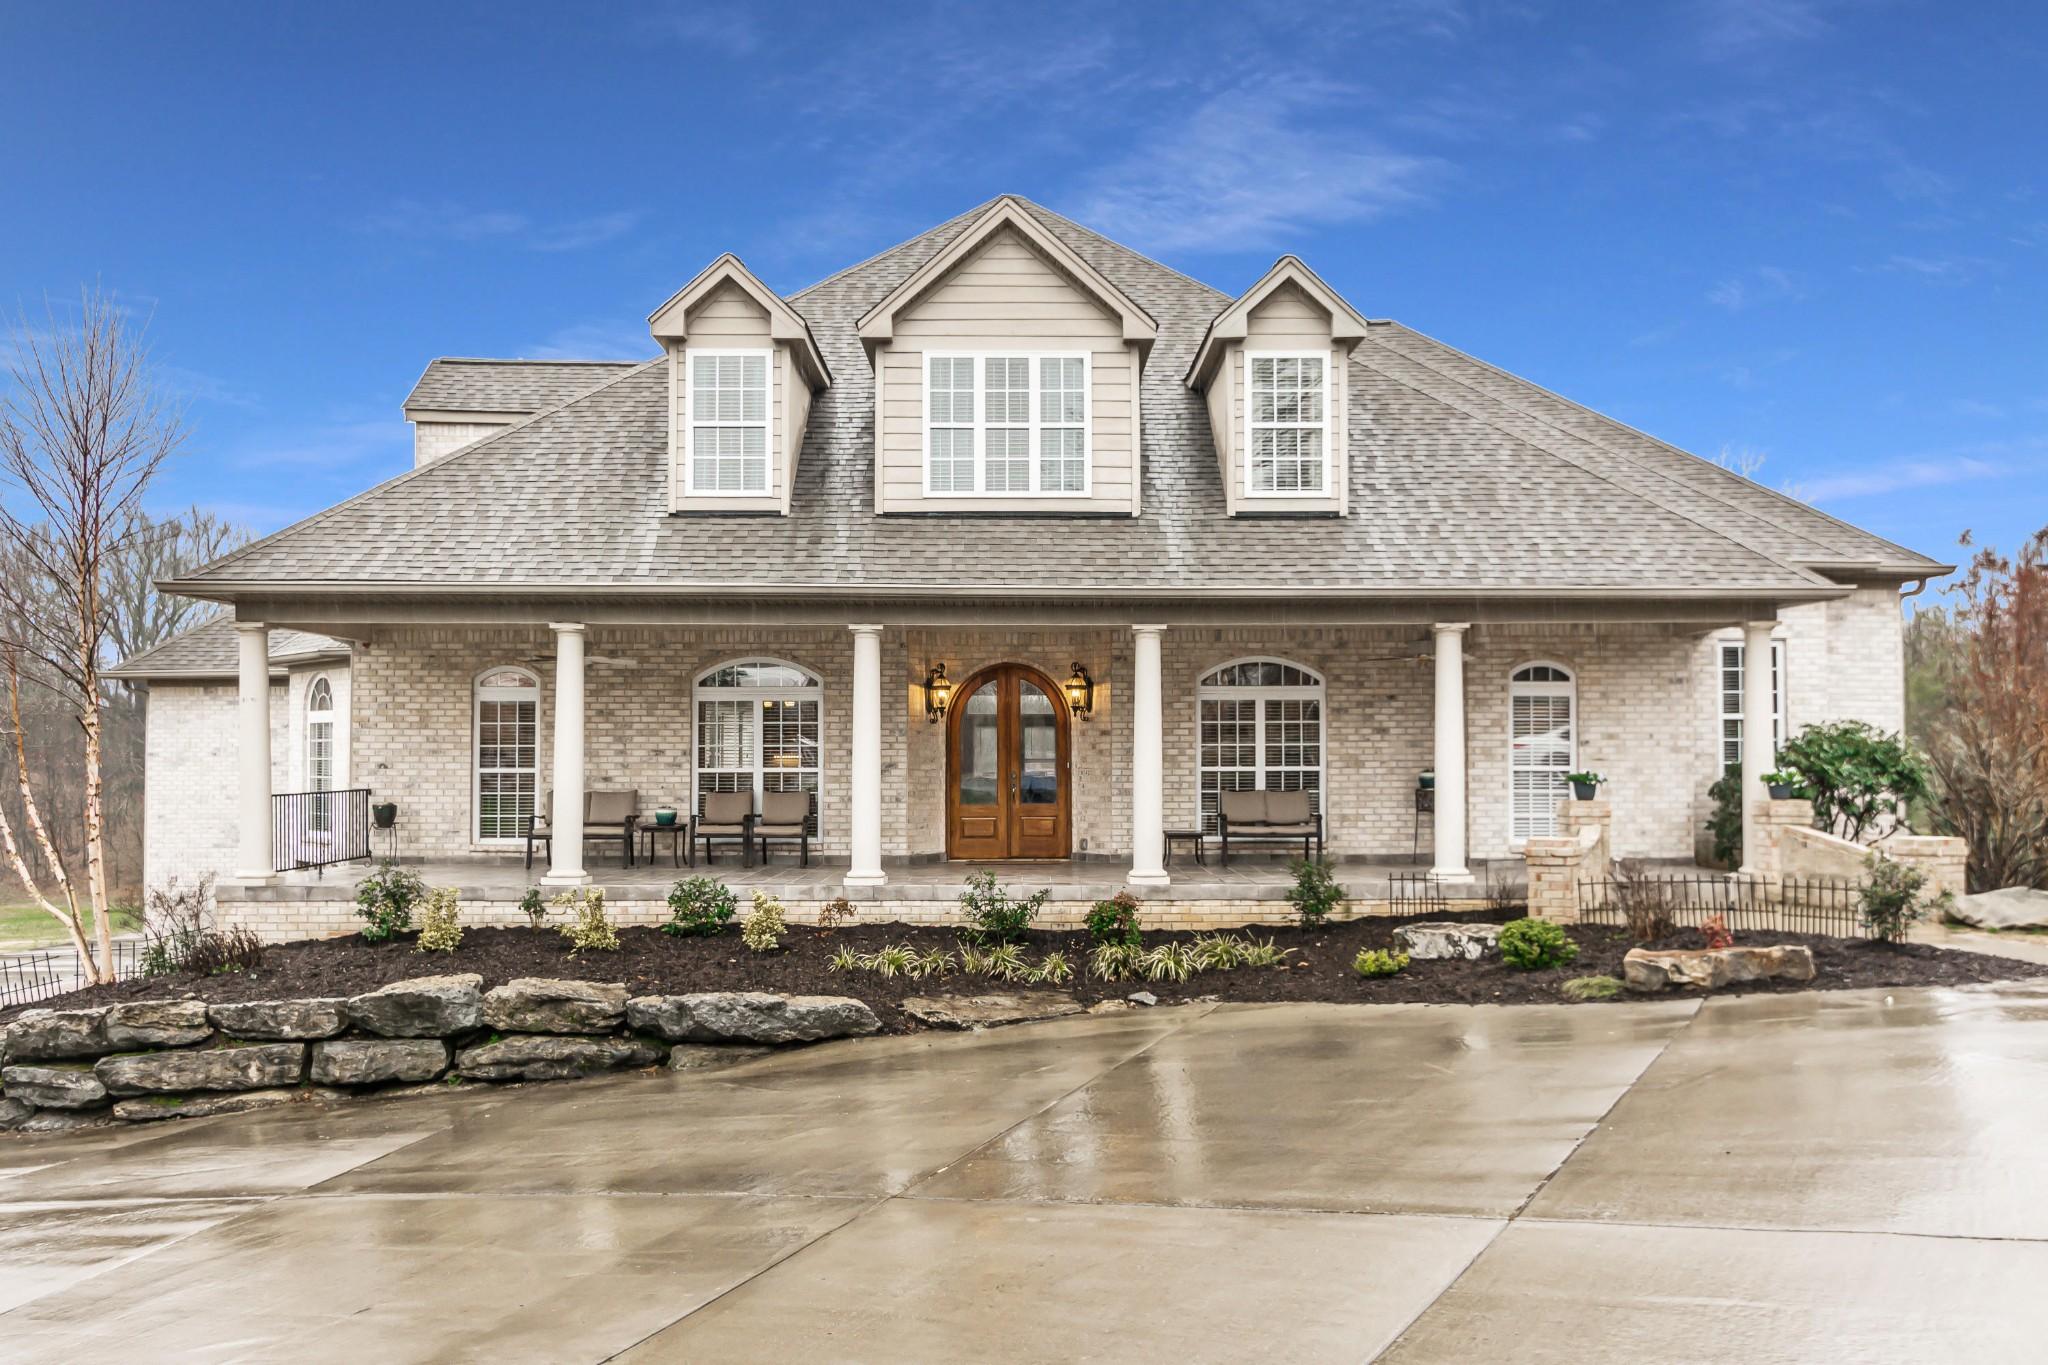 309 Hunters Ln, Hendersonville, TN 37075 - Hendersonville, TN real estate listing